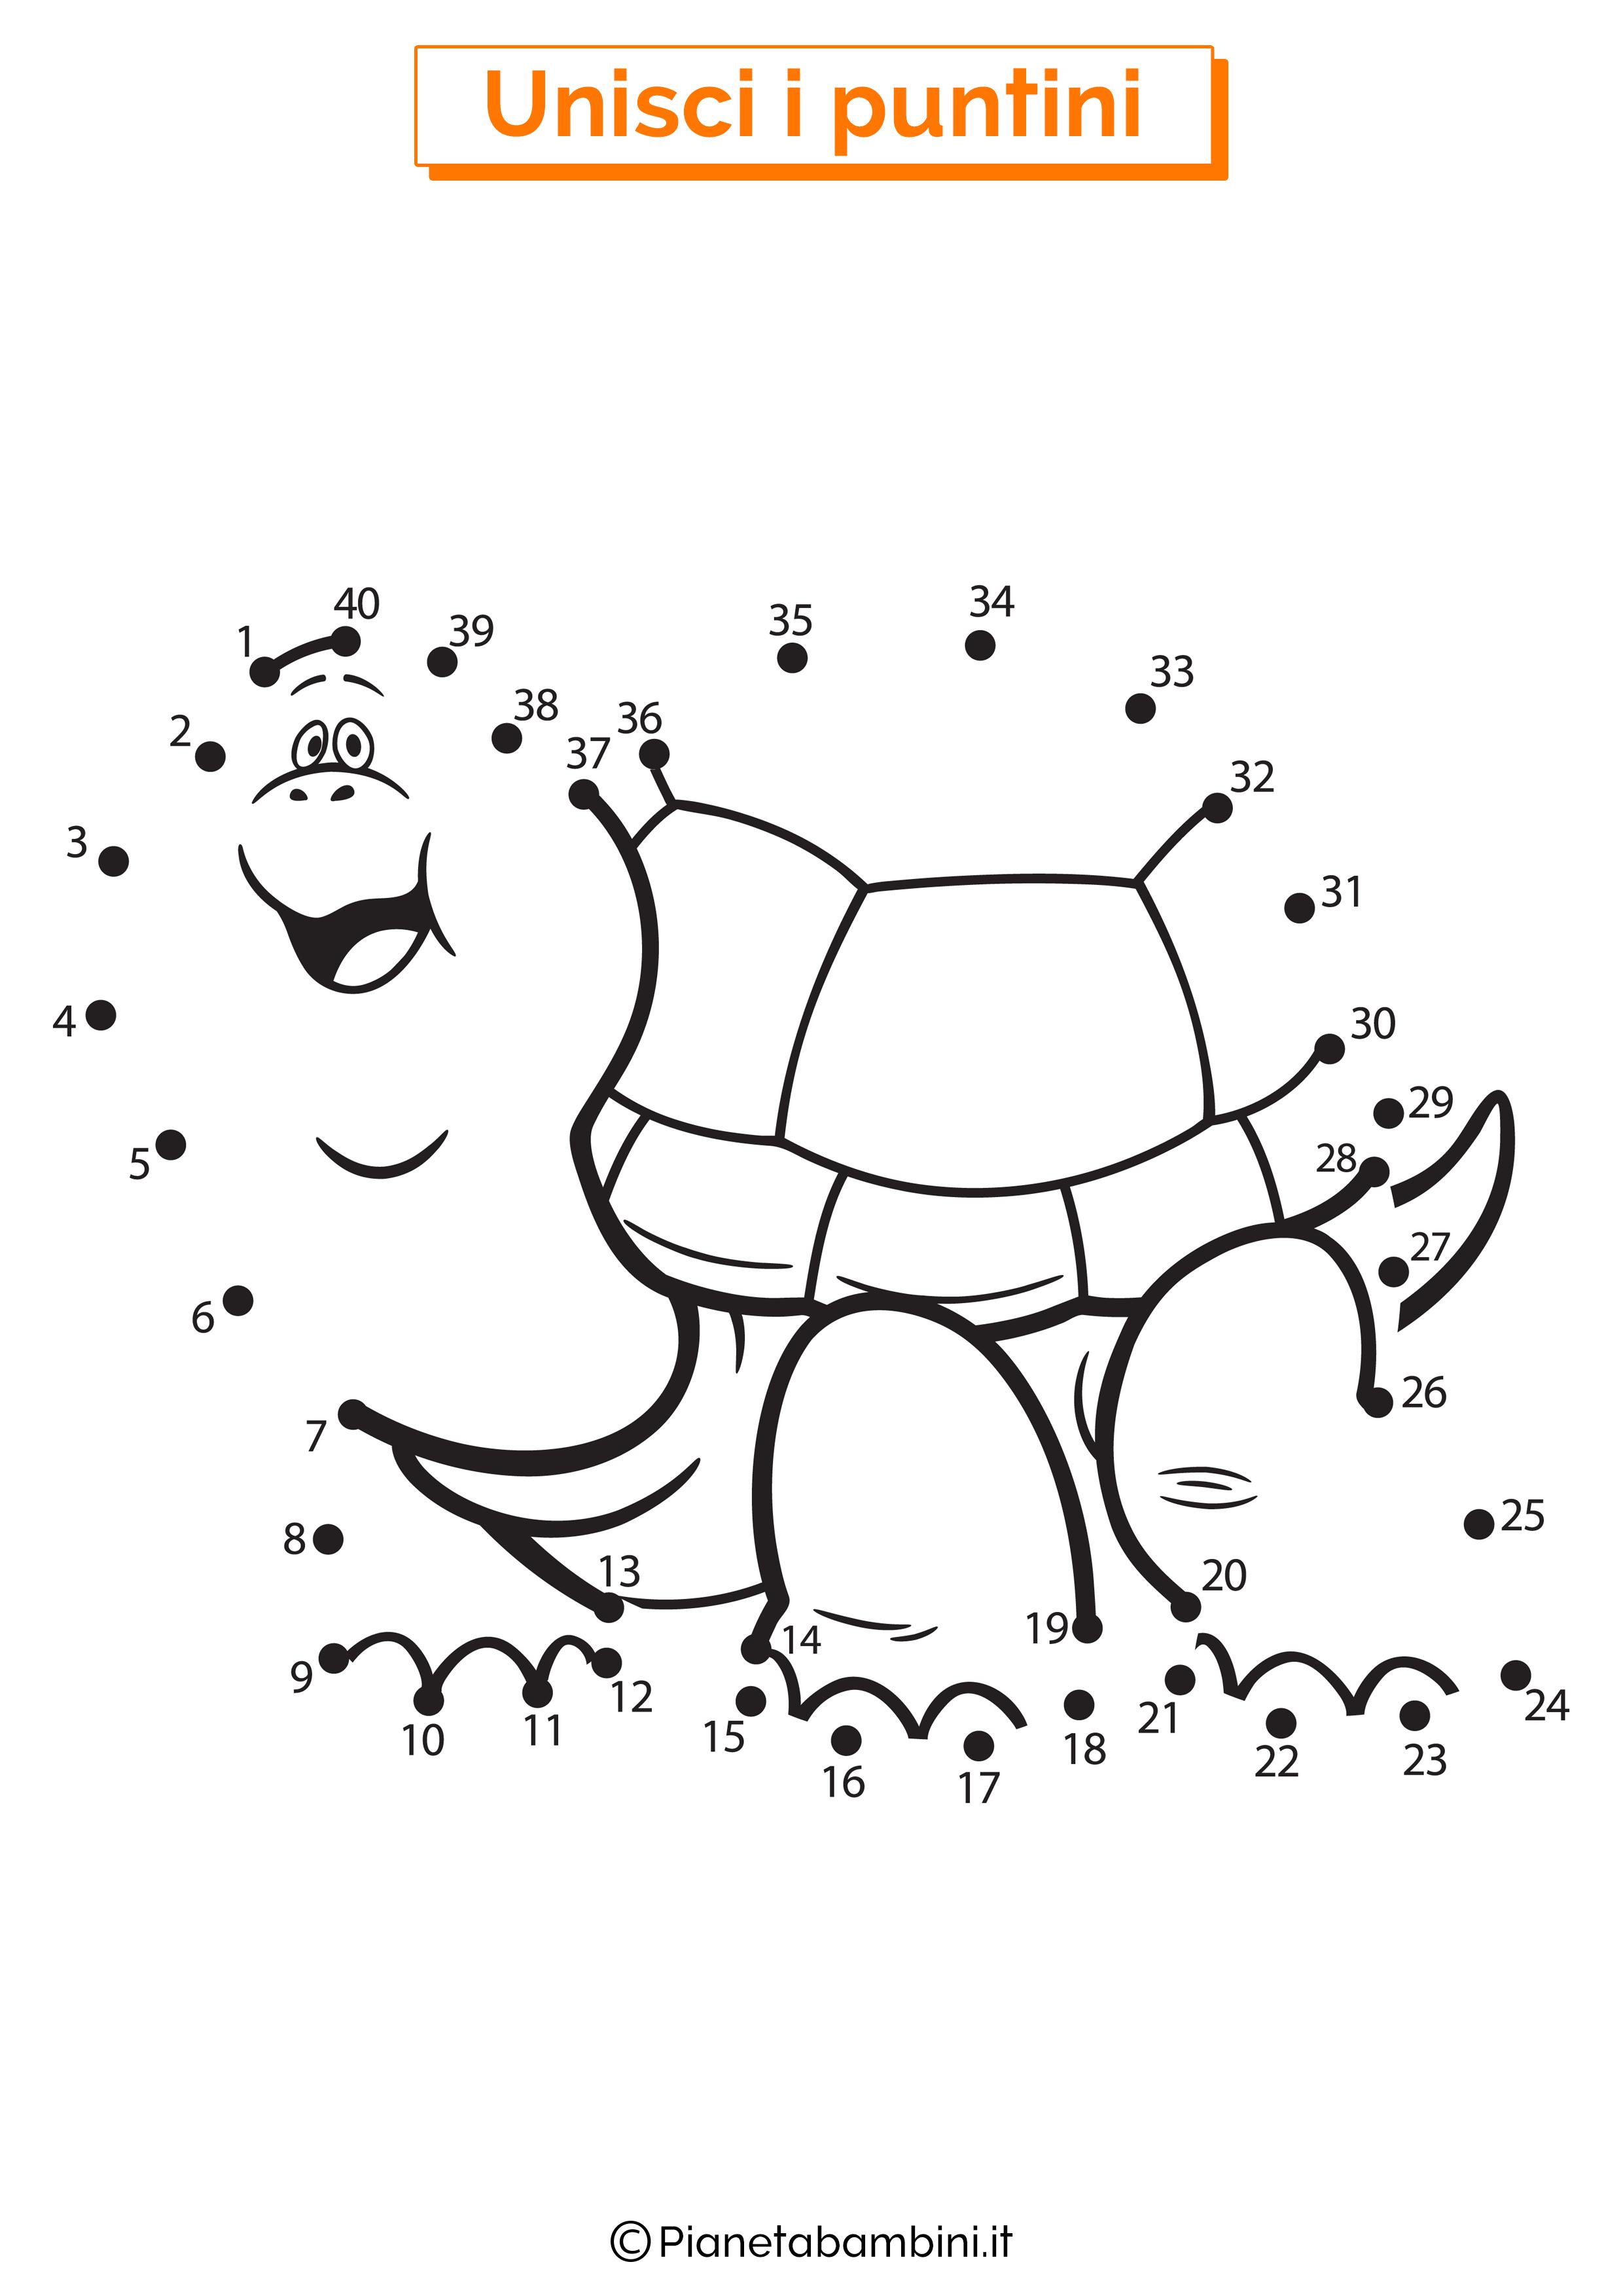 Disegno unisci i puntini 1-40 tartaruga